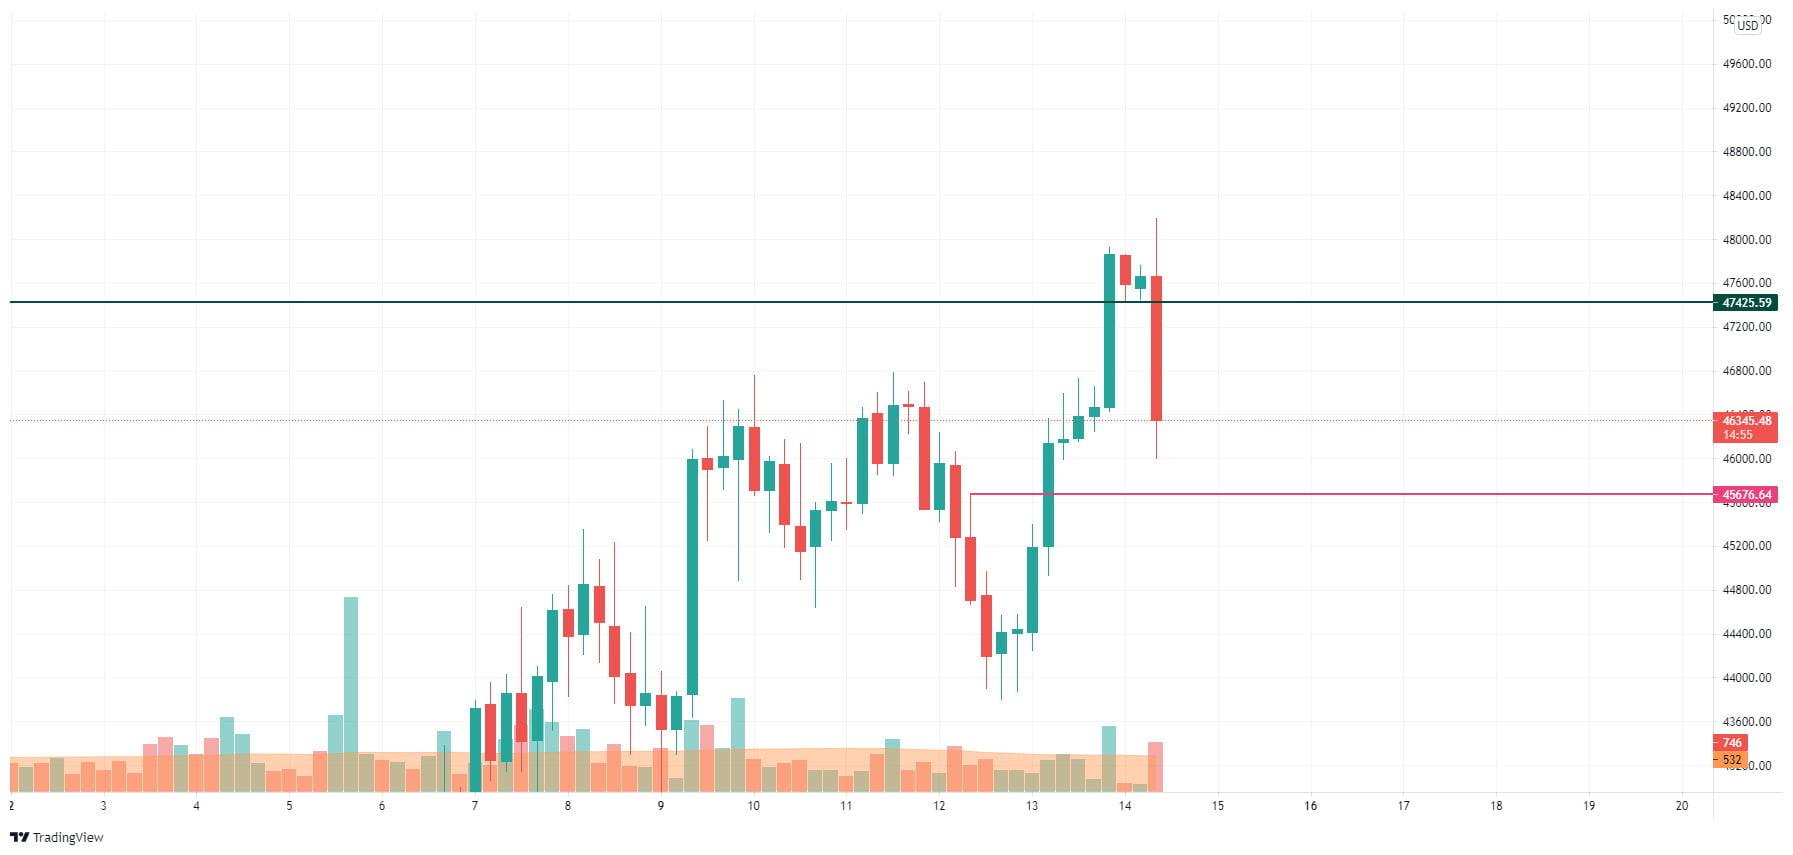 14 Ağustos Bitcoin (BTC) Fiyat Analizi: BTC 50.000 Dolara Ulaşabilir mi? 3 - 14 agustos bitcoin btc fiyat analizi 3